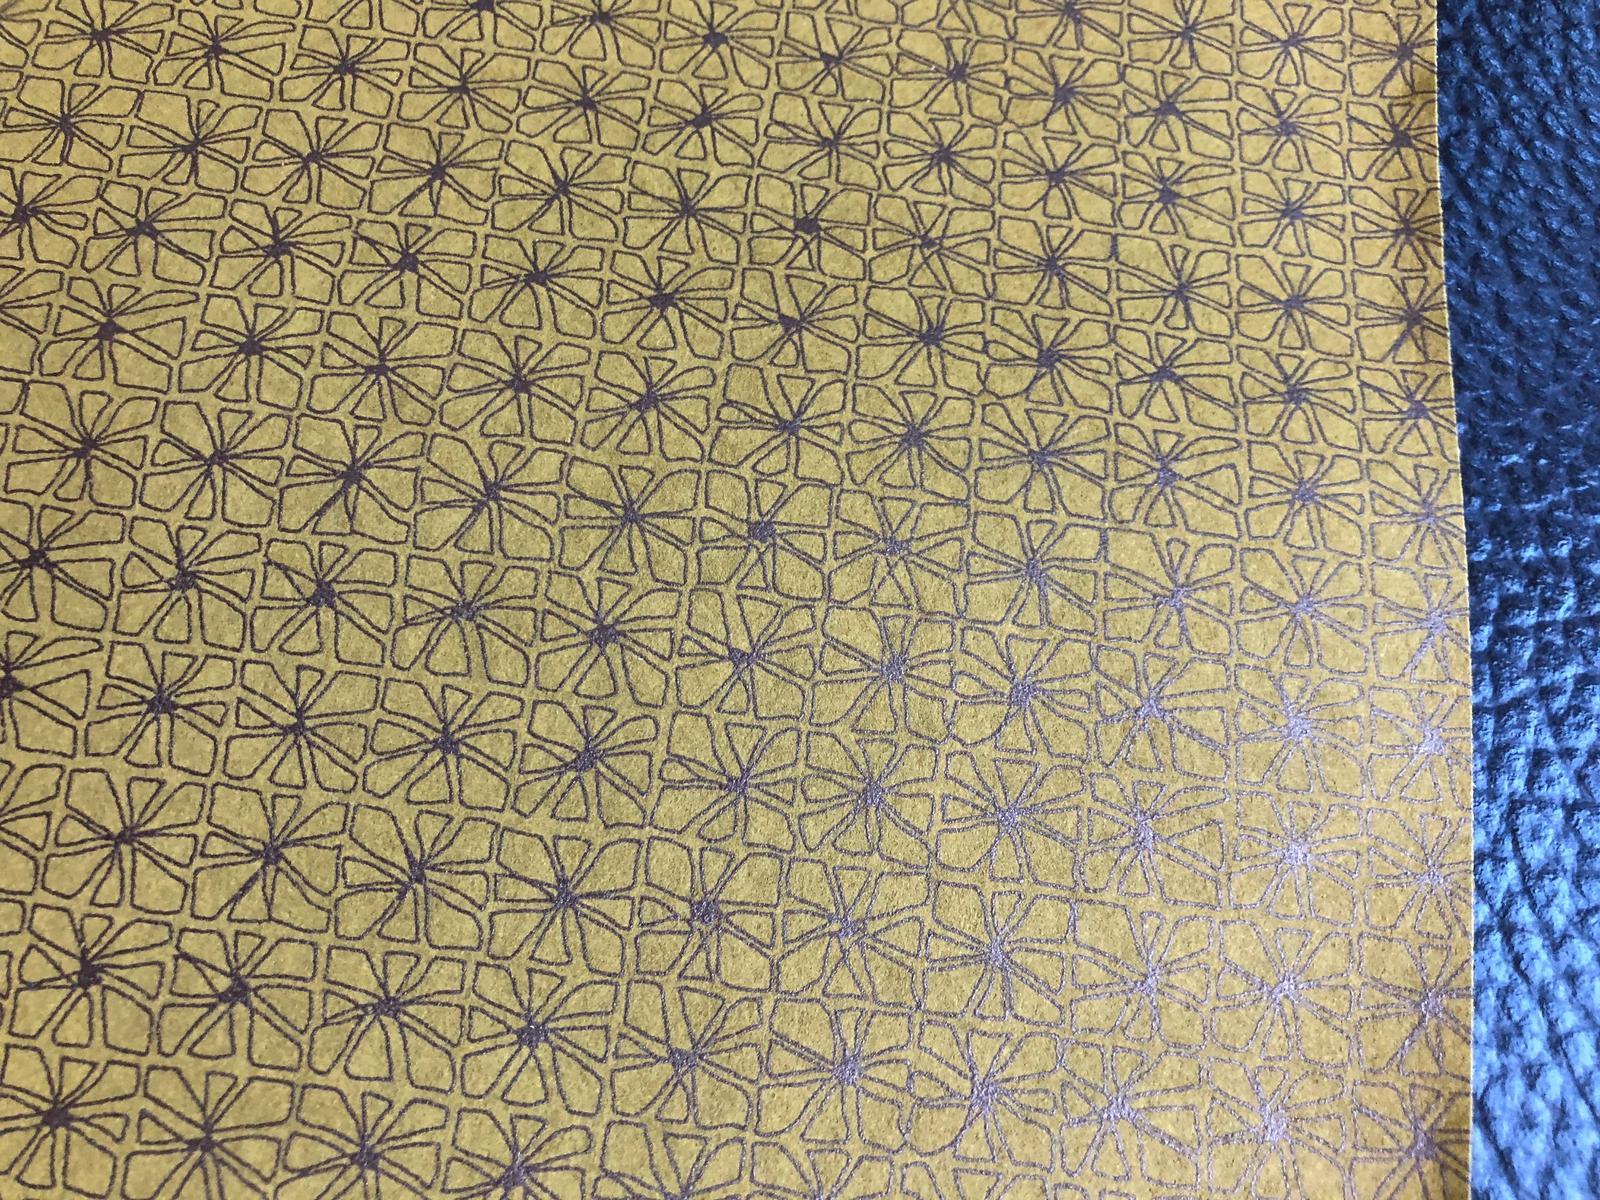 Horcicovozlta tapeta - zbytok - Obrázok č. 1